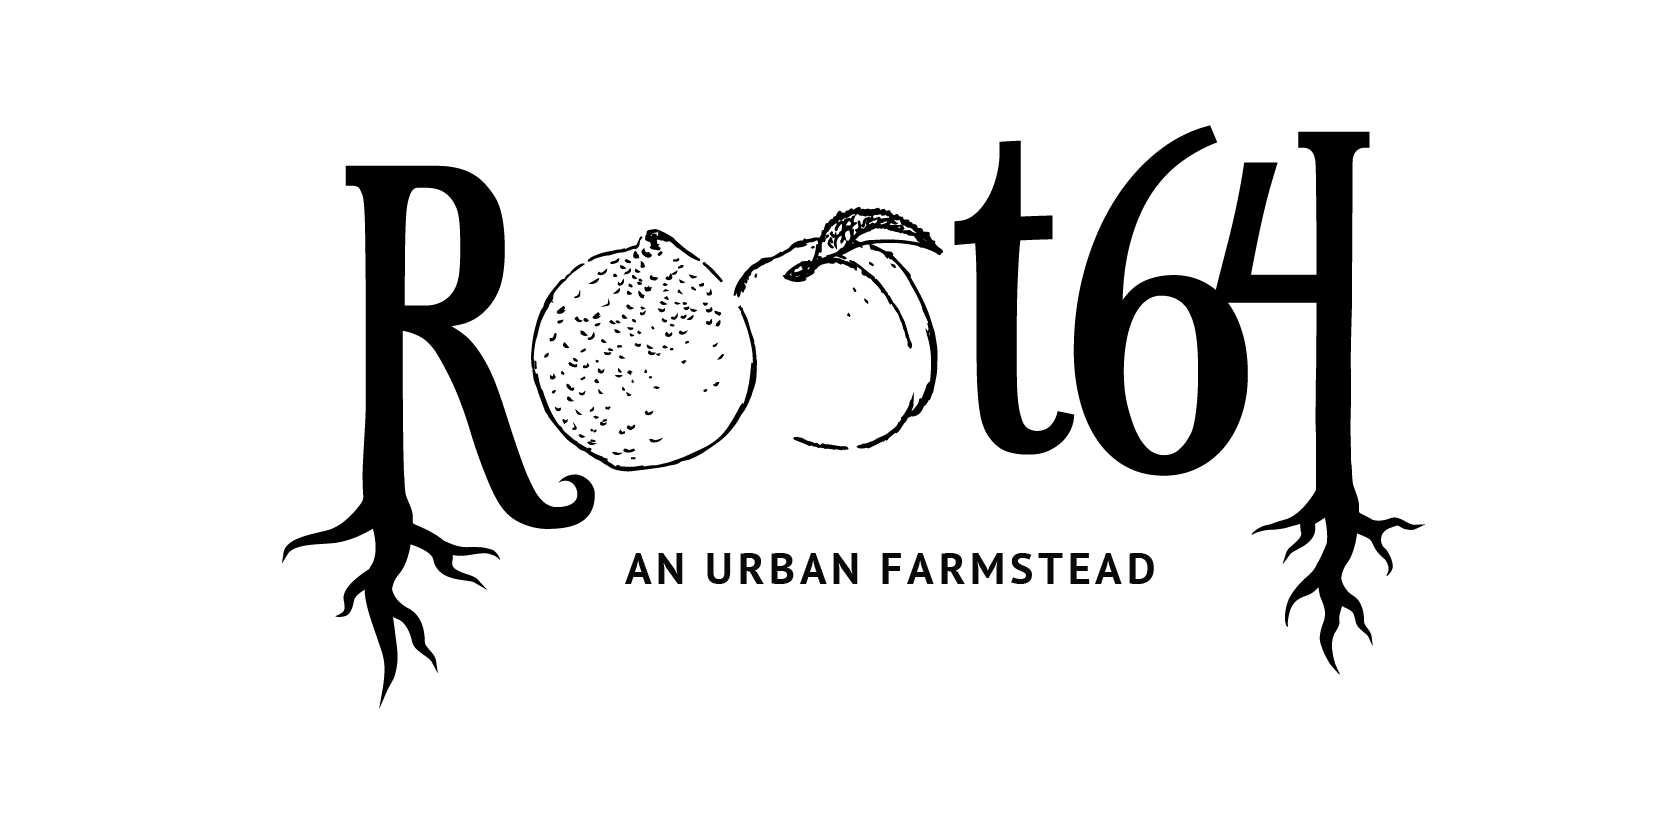 root64logo_F_01c.png